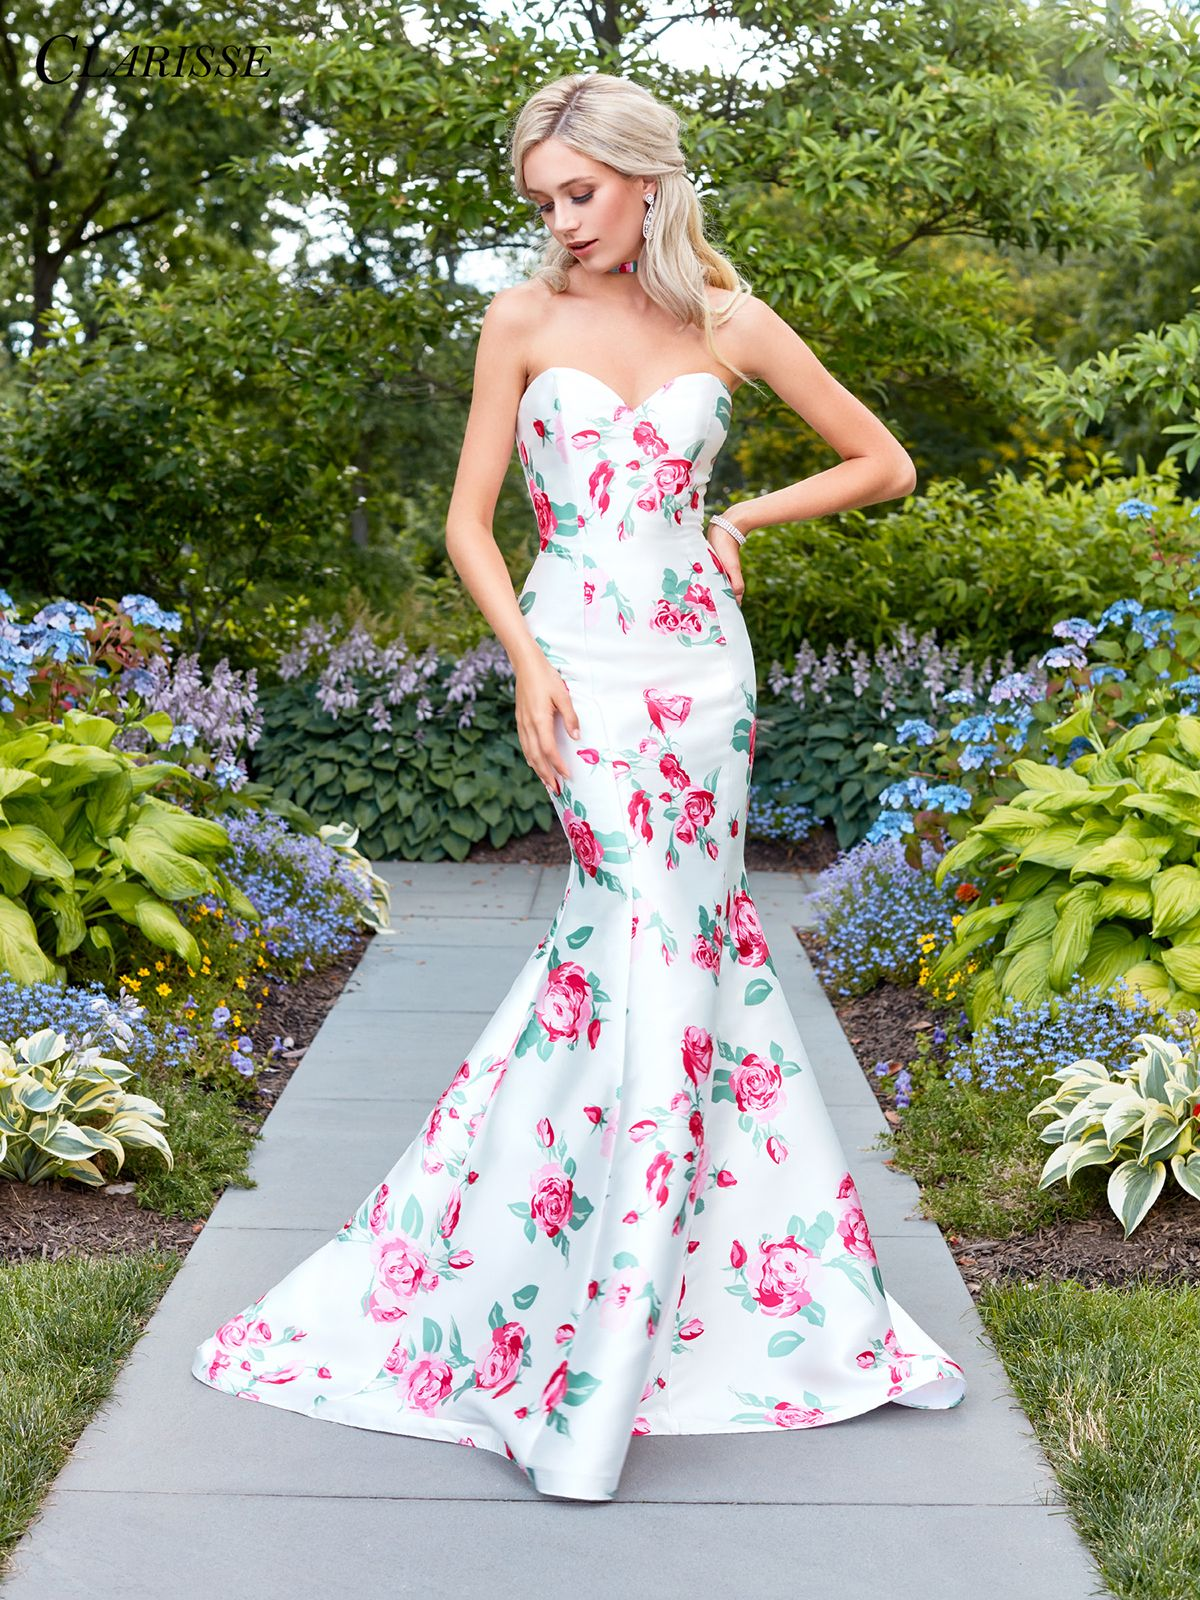 Strapless White Print Mermaid Prom Dress 3424 Backless Mermaid Prom Dresses Mermaid Formal Gowns Mermaid Prom Dresses [ 1600 x 1200 Pixel ]